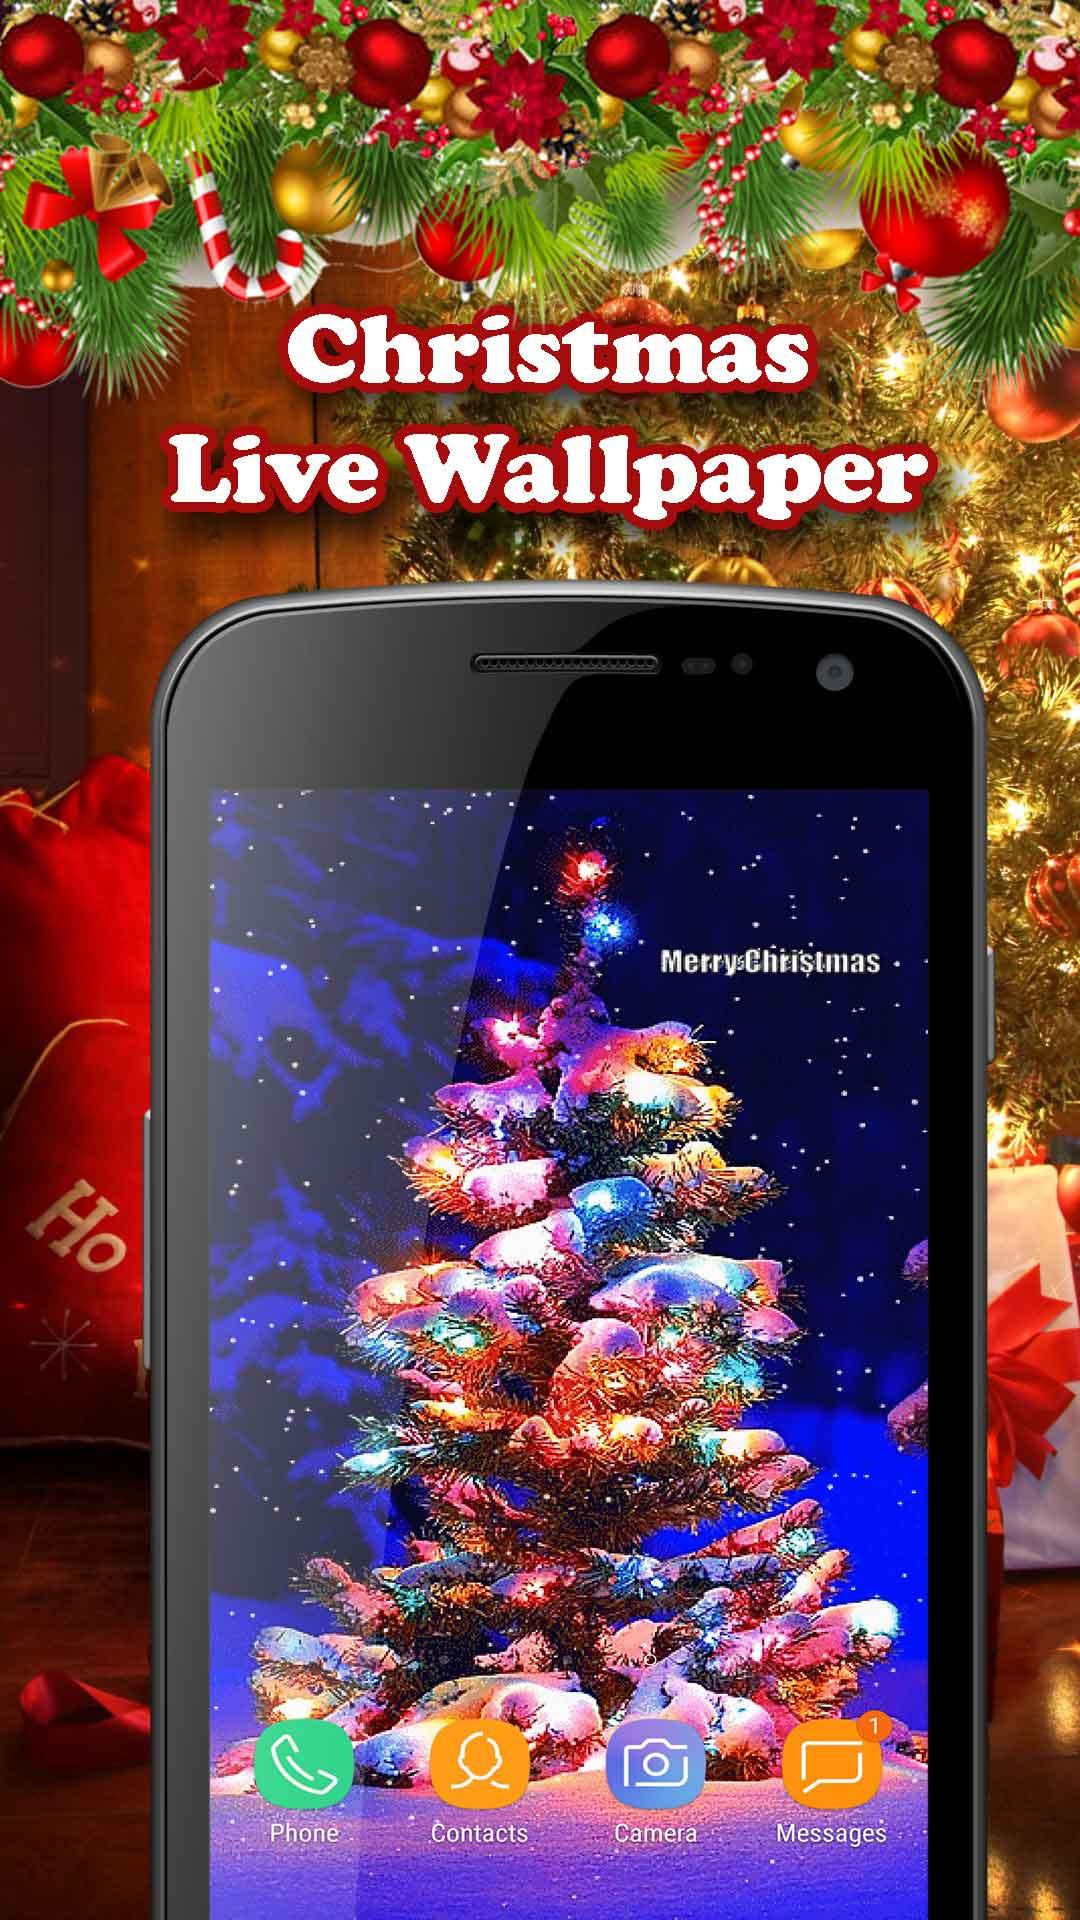 4k Christmas Wallpaper Iphone 1080x1920 Download Hd Wallpaper Wallpapertip